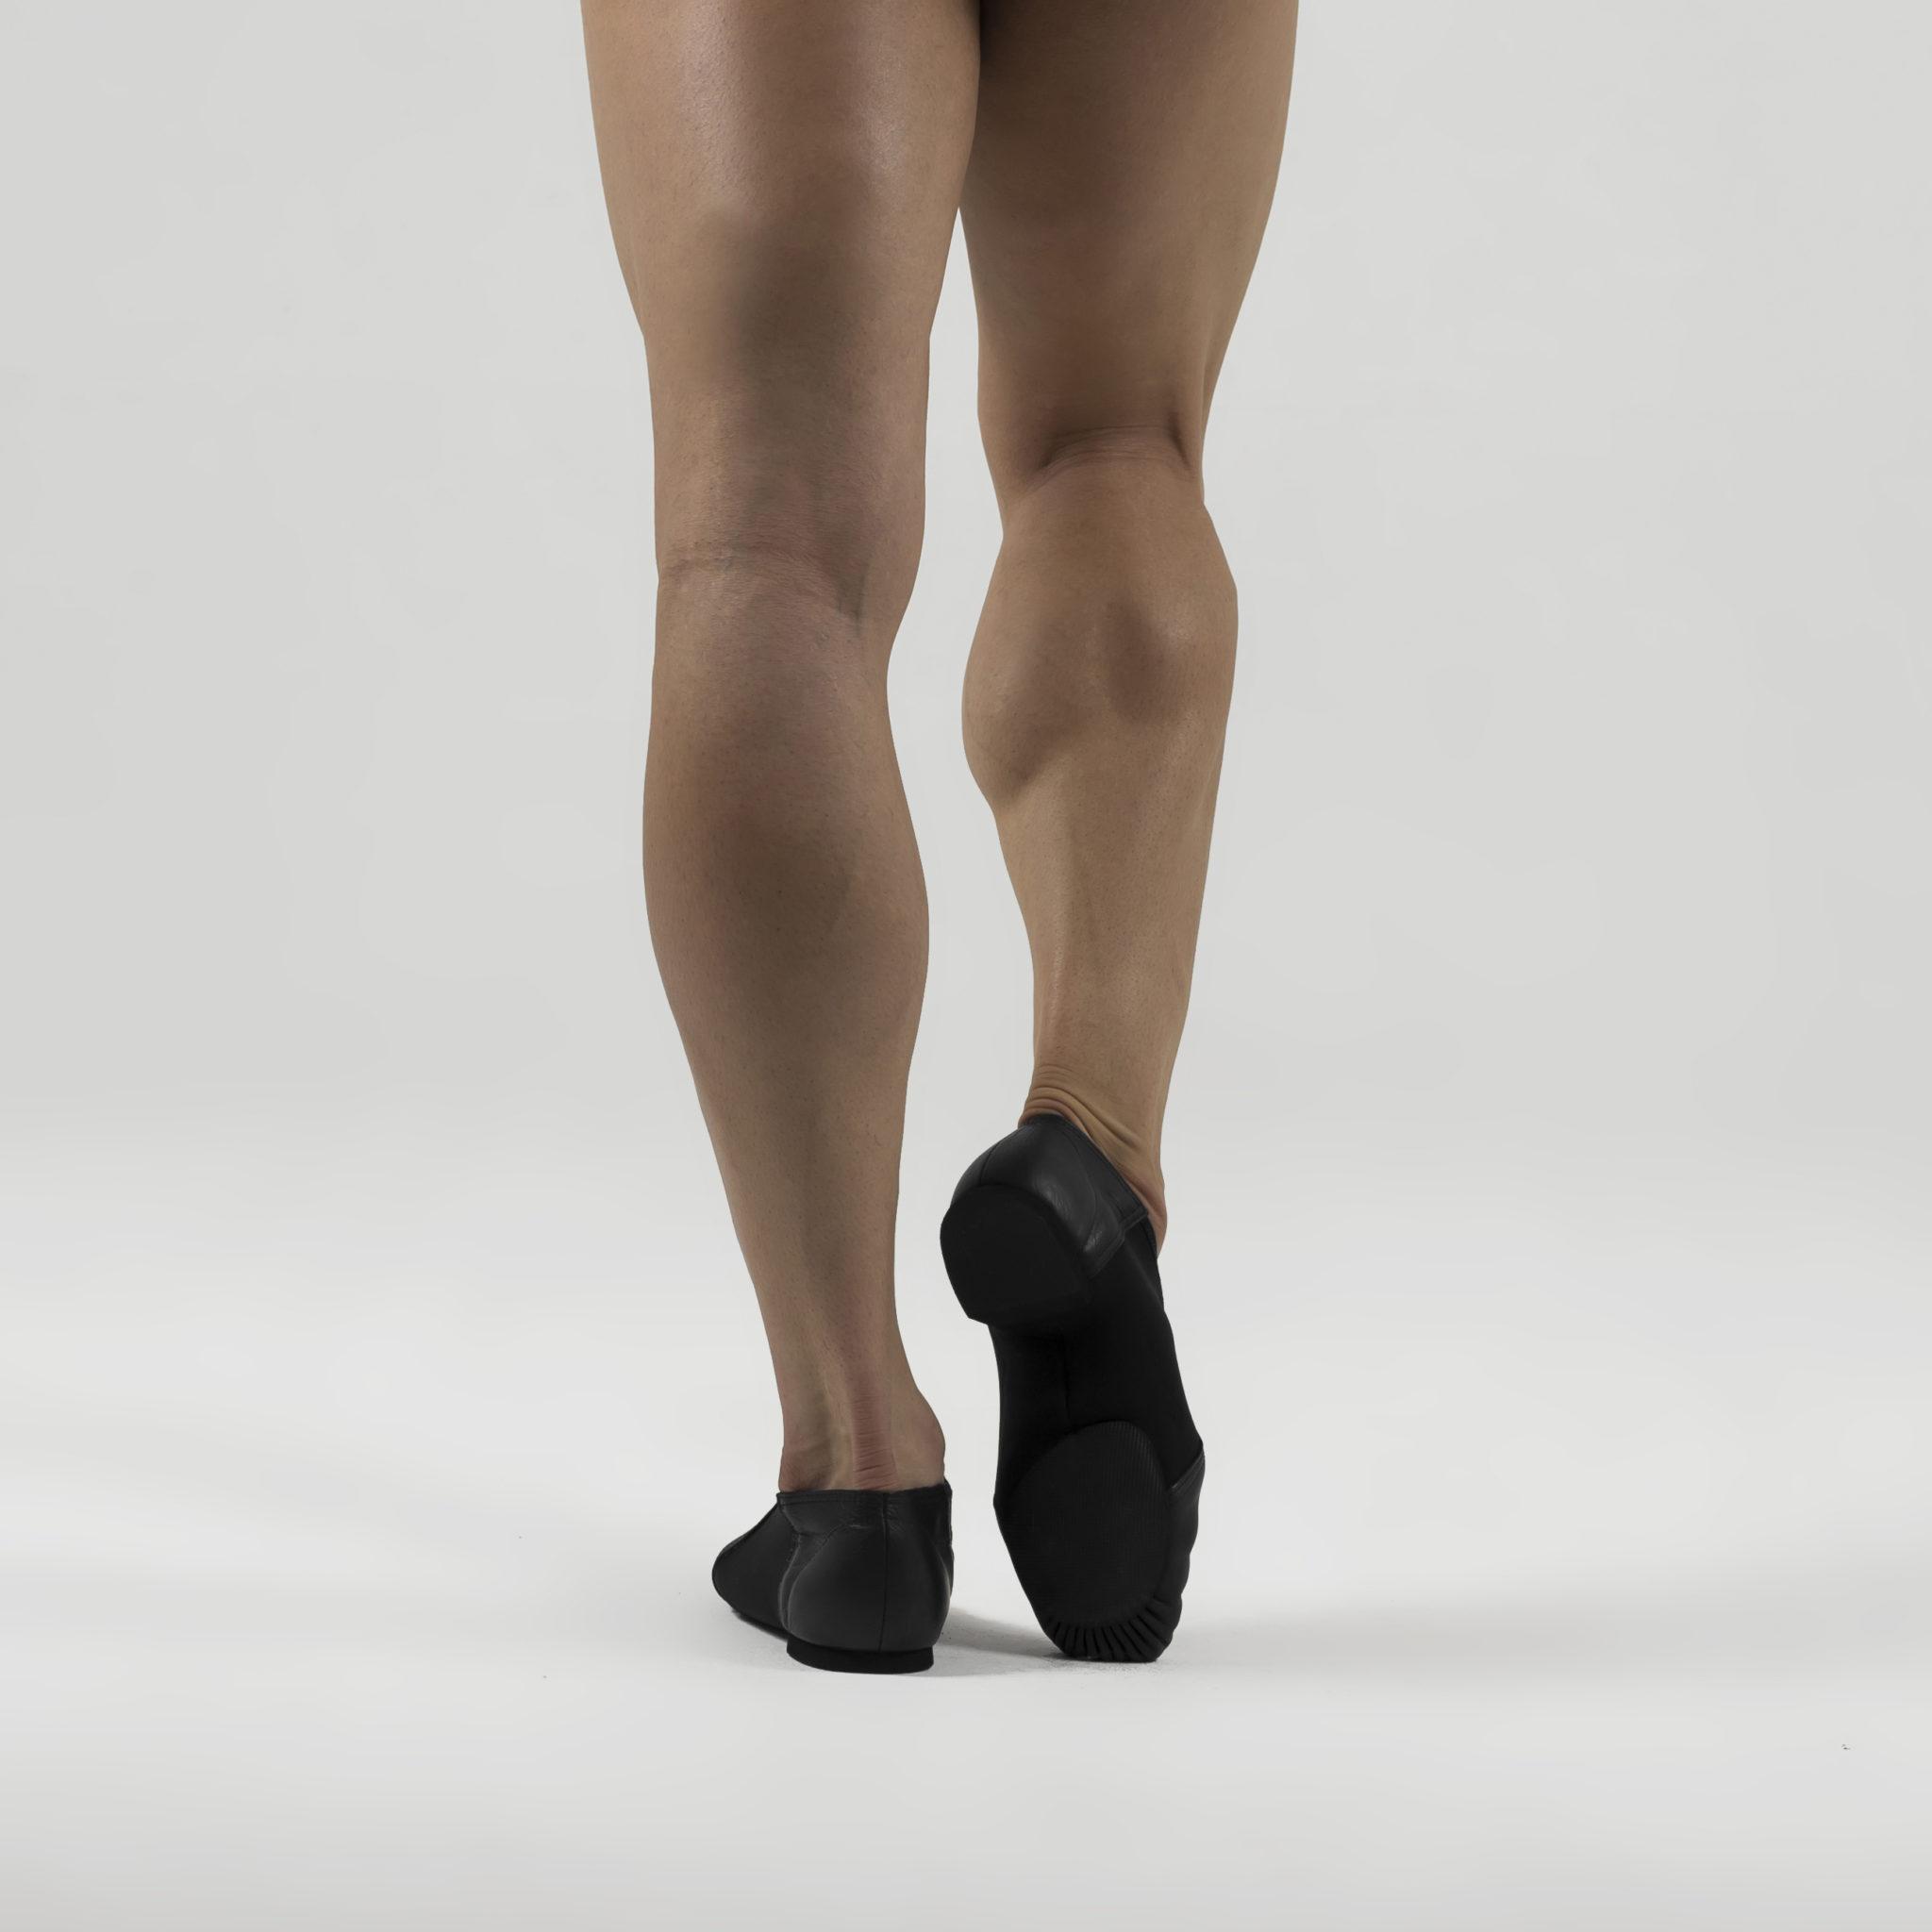 a018354263e Botinha Neoprene - 12 - Evidence Ballet - Loja Virtual